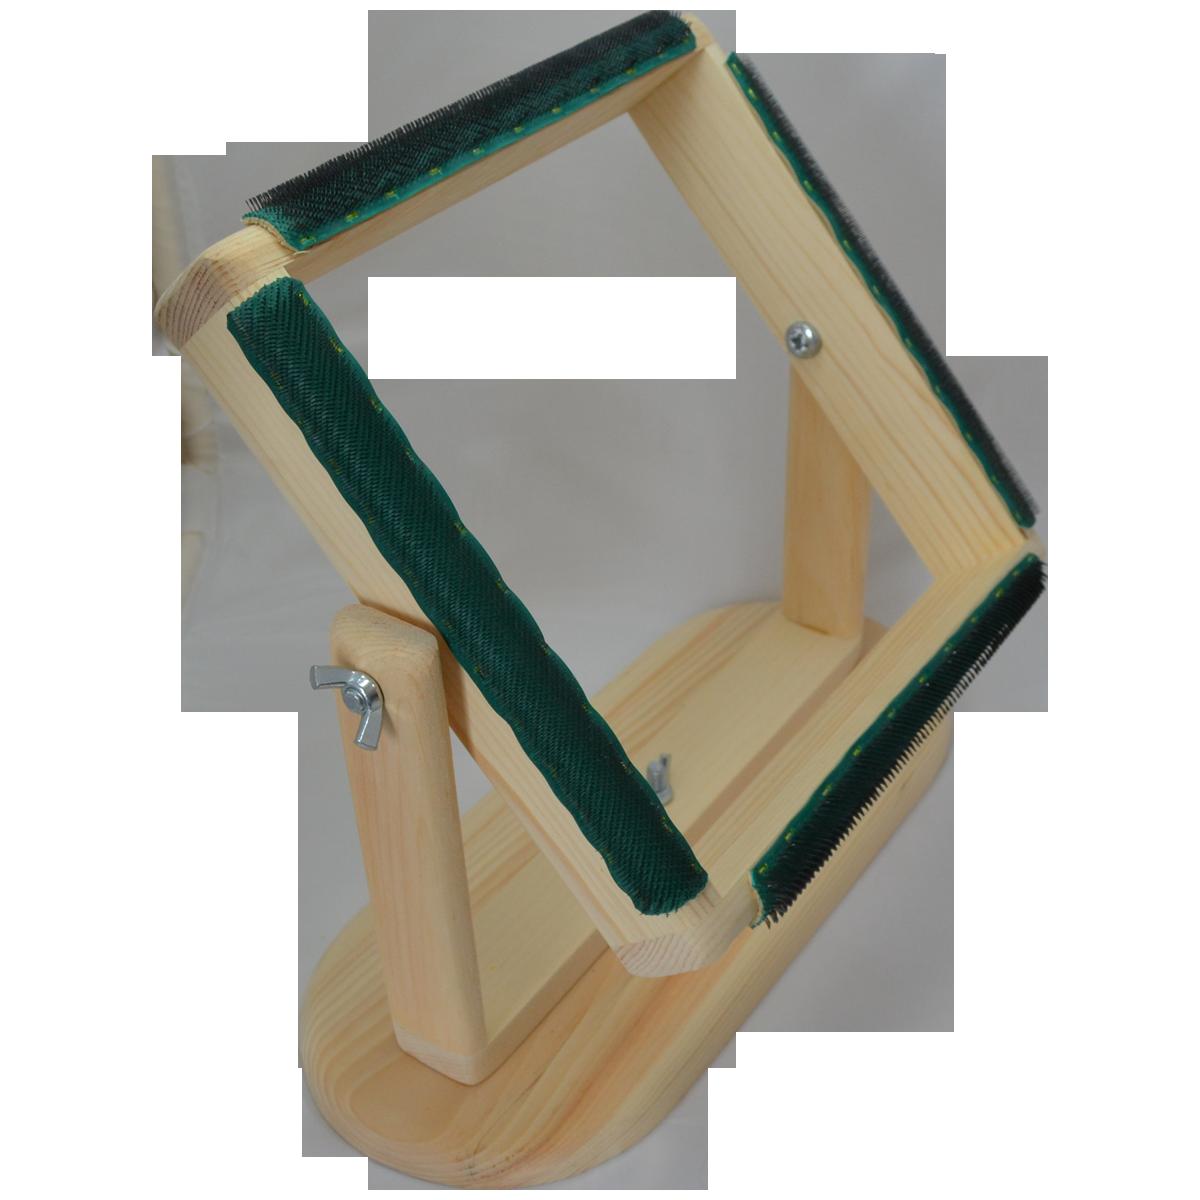 Rug Hooking Frame 12 X 12 Portable Affordable Great For Beginners And Travel Rug Hooking Frames Rug Hooking Hooked Rugs Primitive